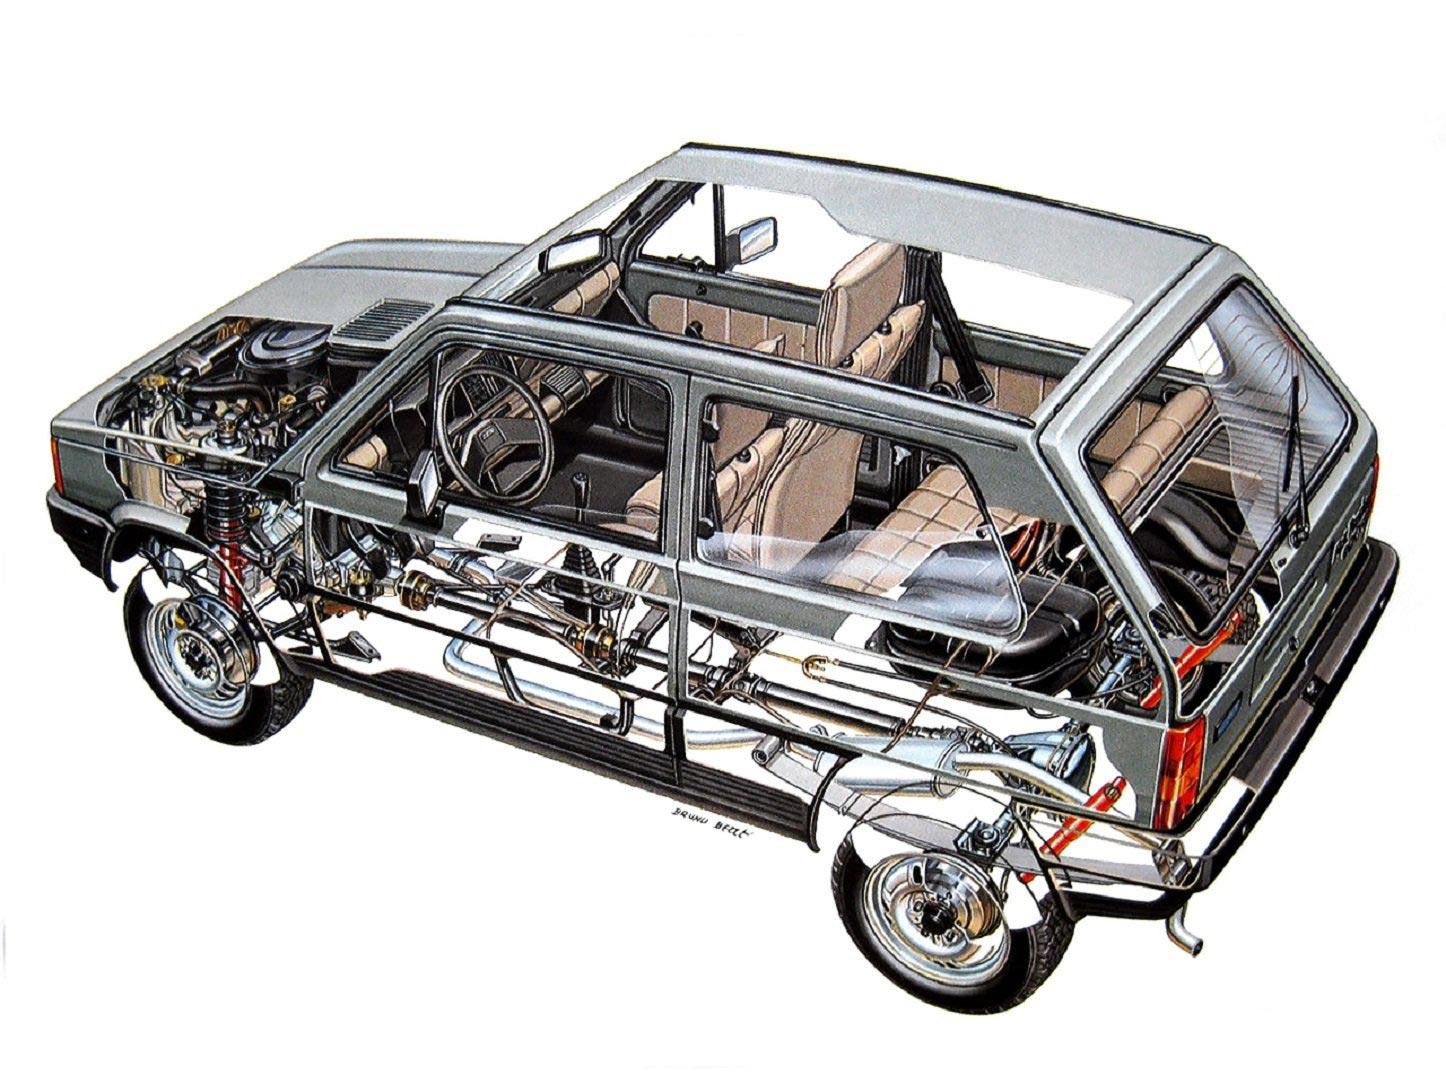 Fiat Panda cutaway